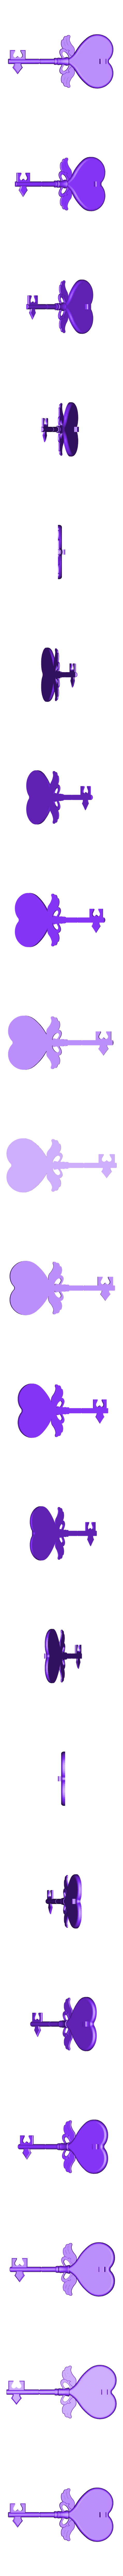 HandleBack.STL Download free STL file Serena's Pokémon Performance Key • 3D printable model, Vexelius